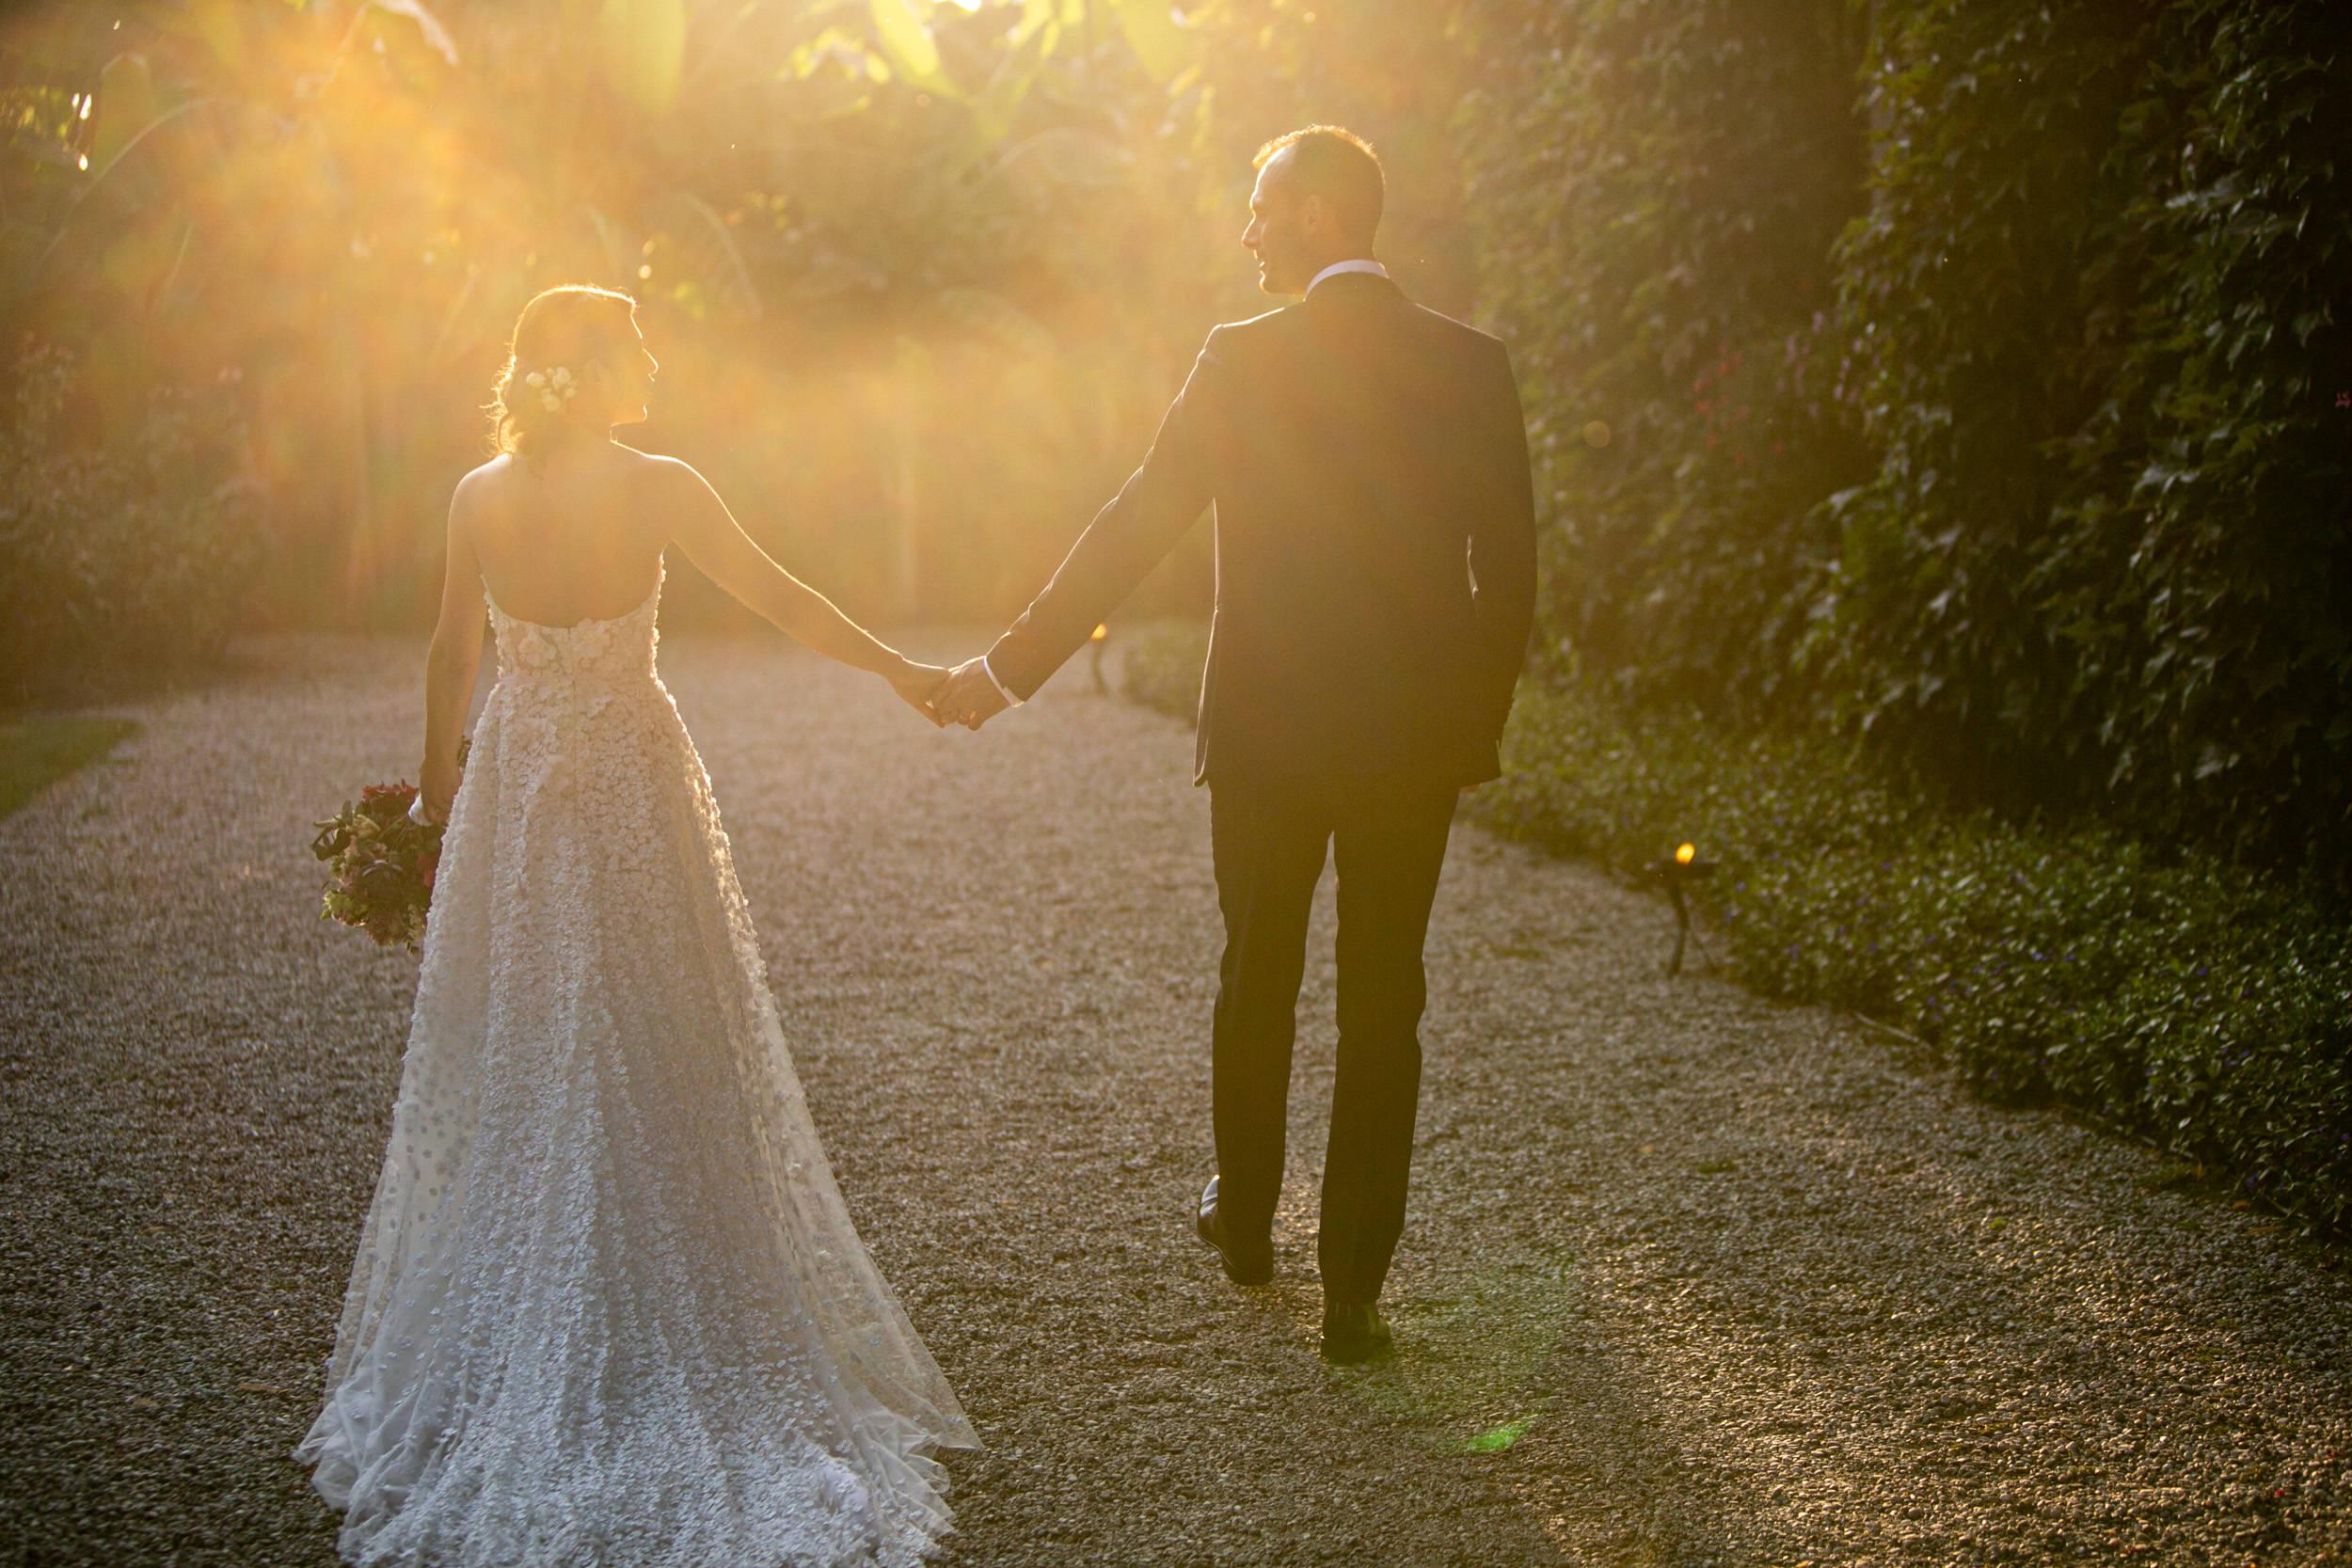 matrimonio_villa-ferrari-gussola_MI-077